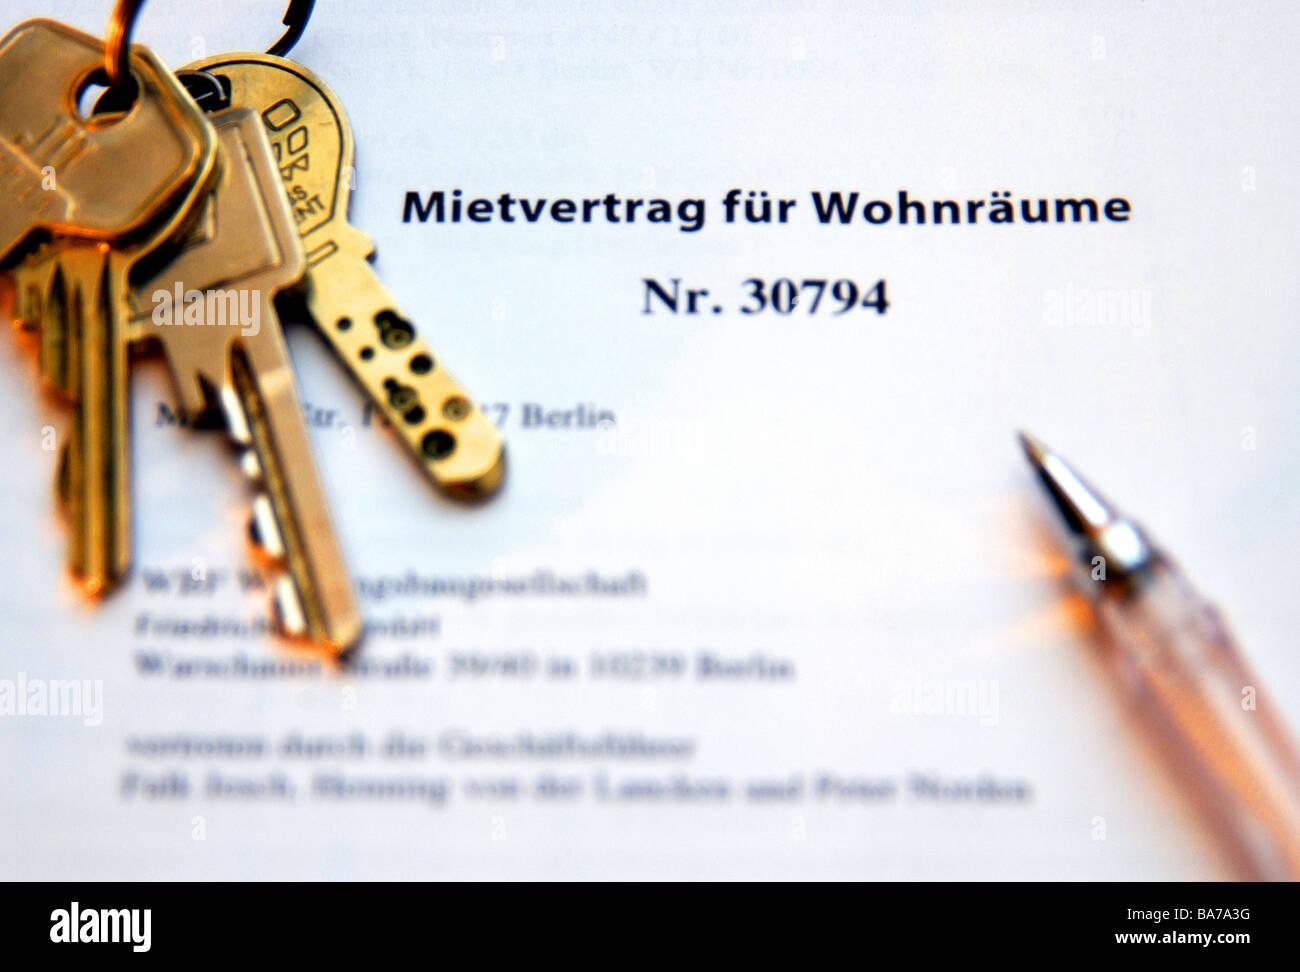 Lease Schlüssel Verband Kugelschreiber Detail Formular Vertrag